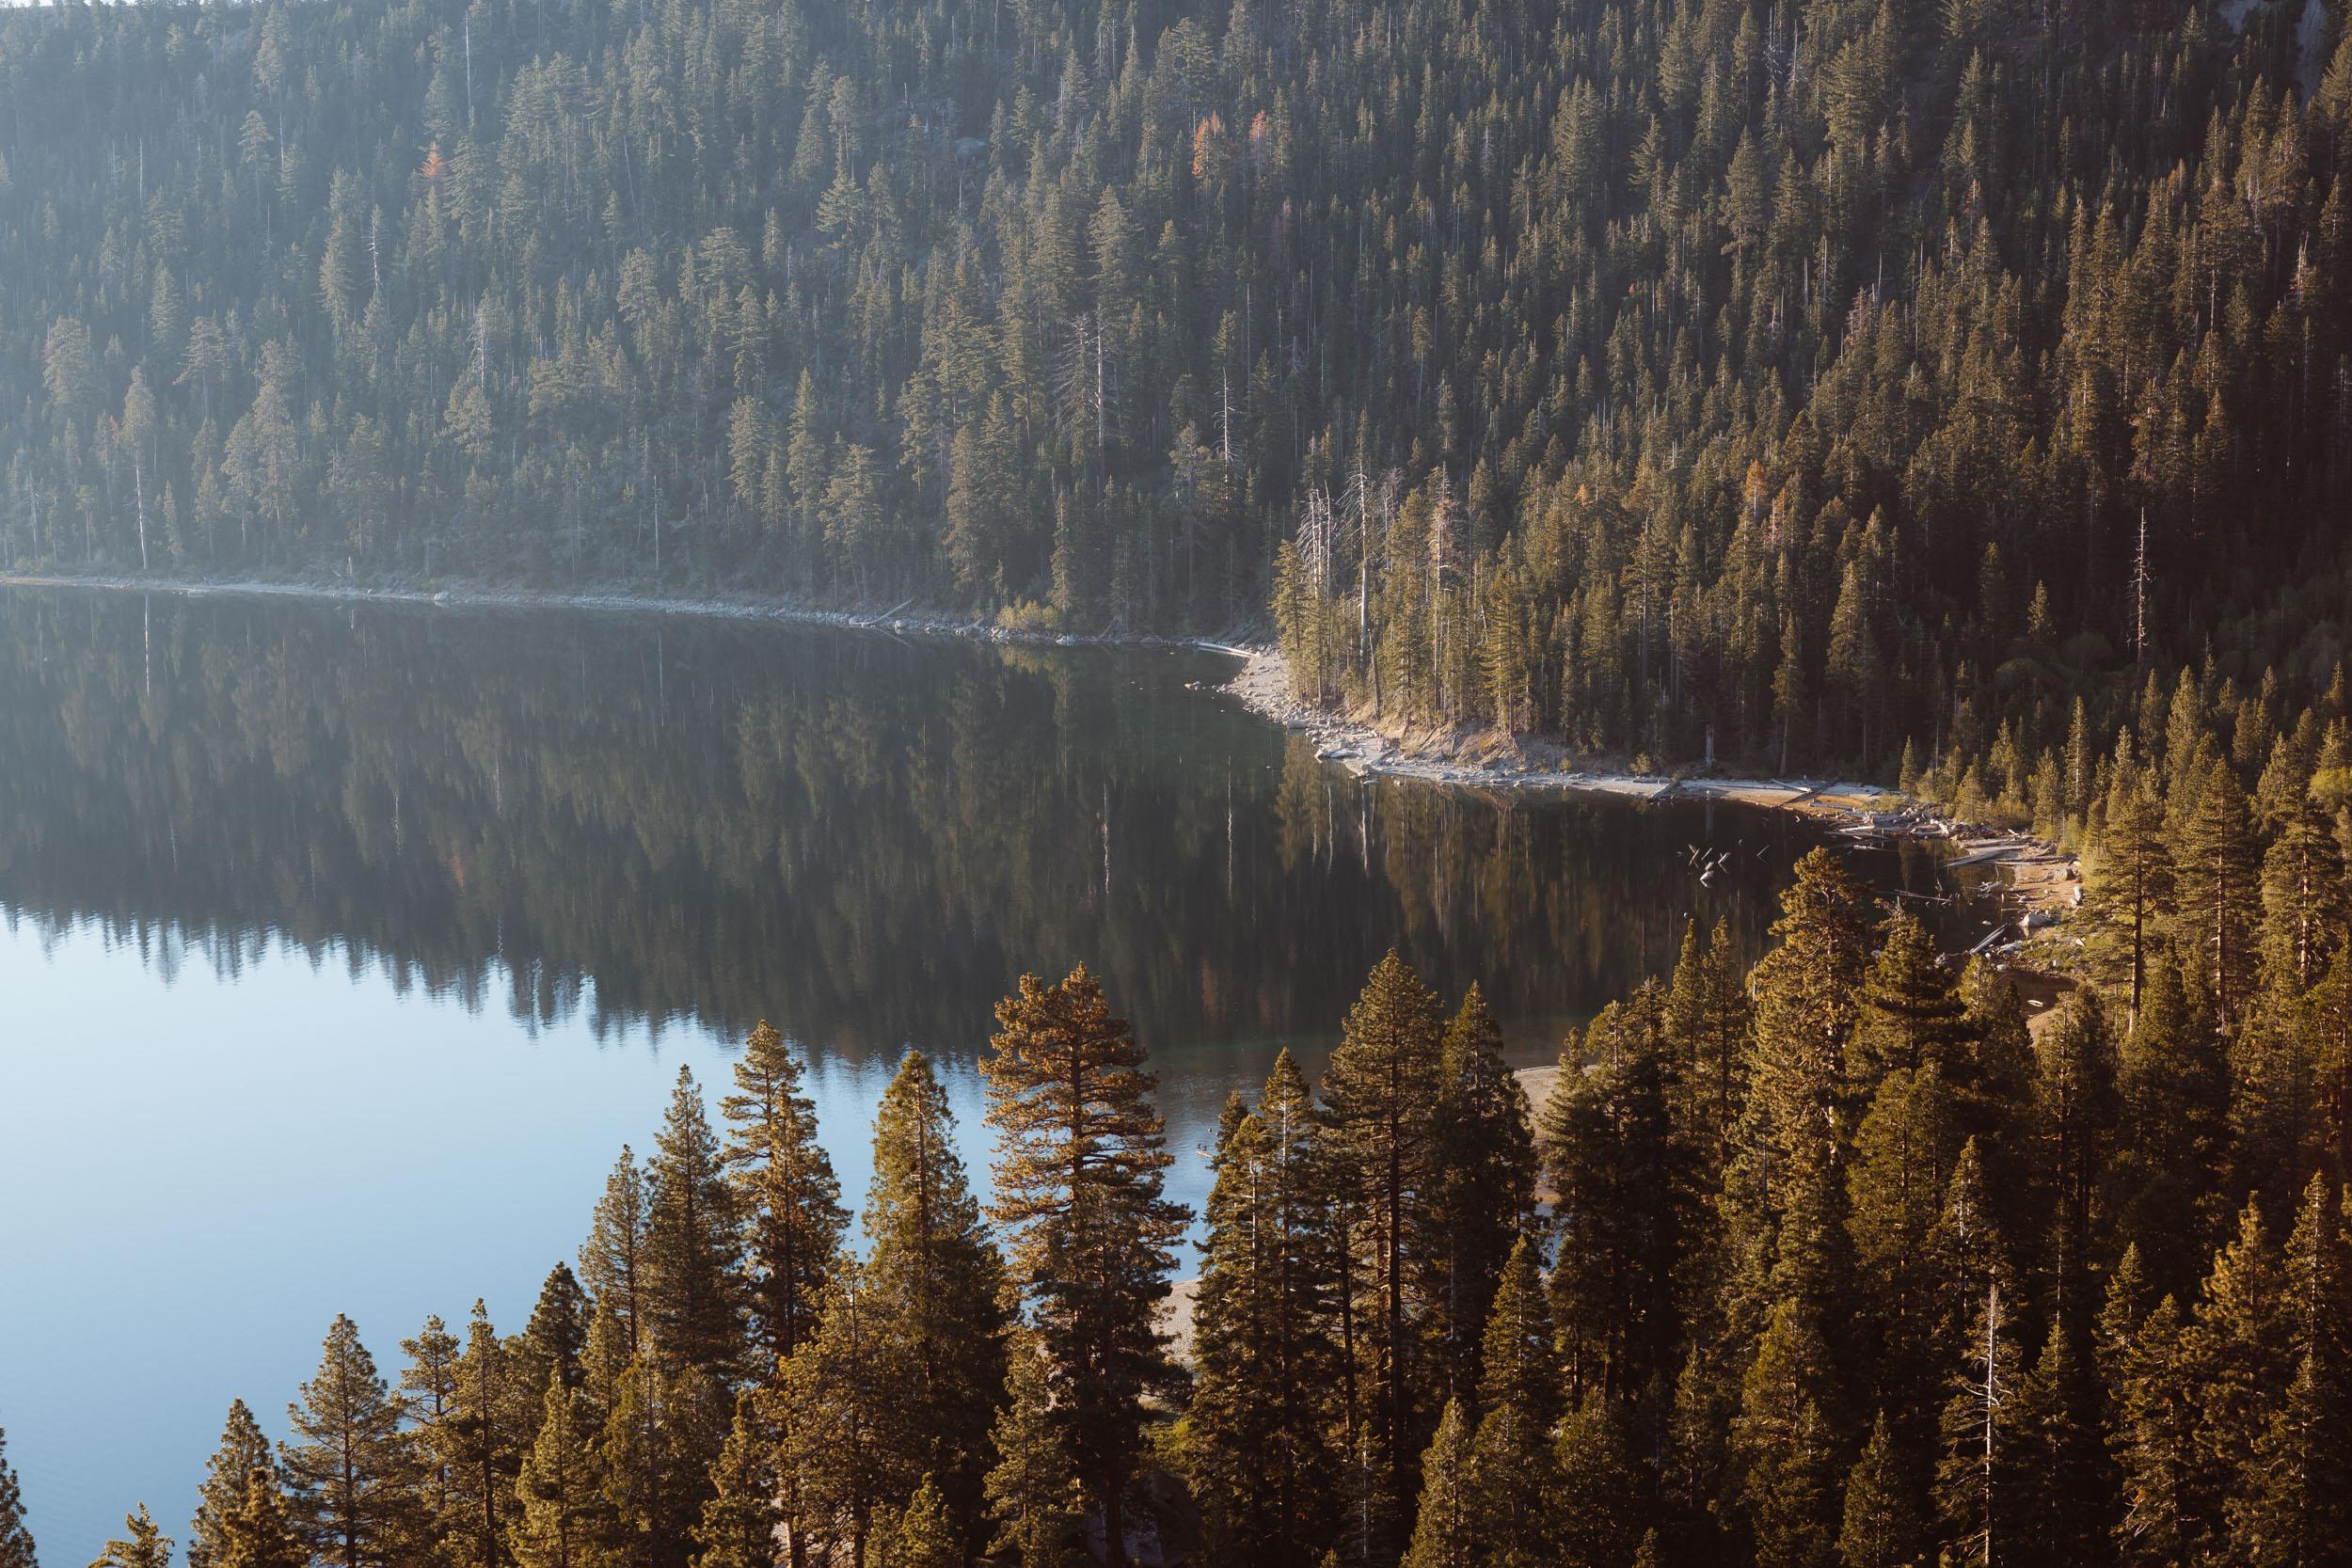 lake-tahoe-emerald-bay-reflection-hike-and-shoot-1.jpg